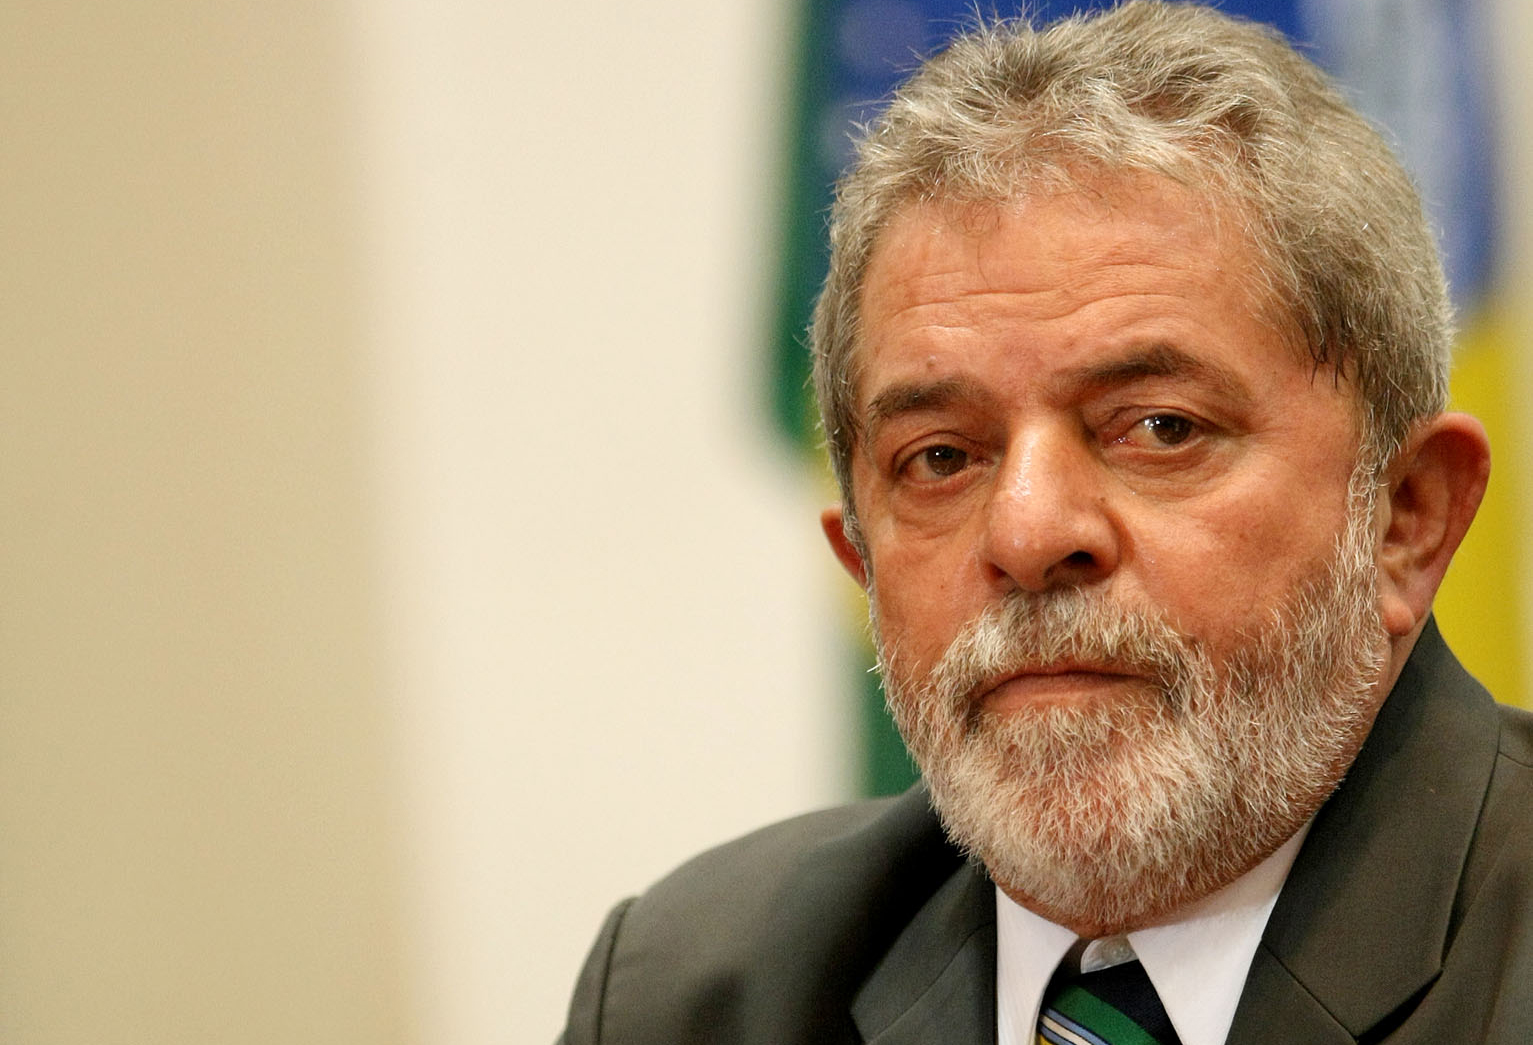 Fiscalía abre investigación penal a Lula por supuesto tráfico de influencias